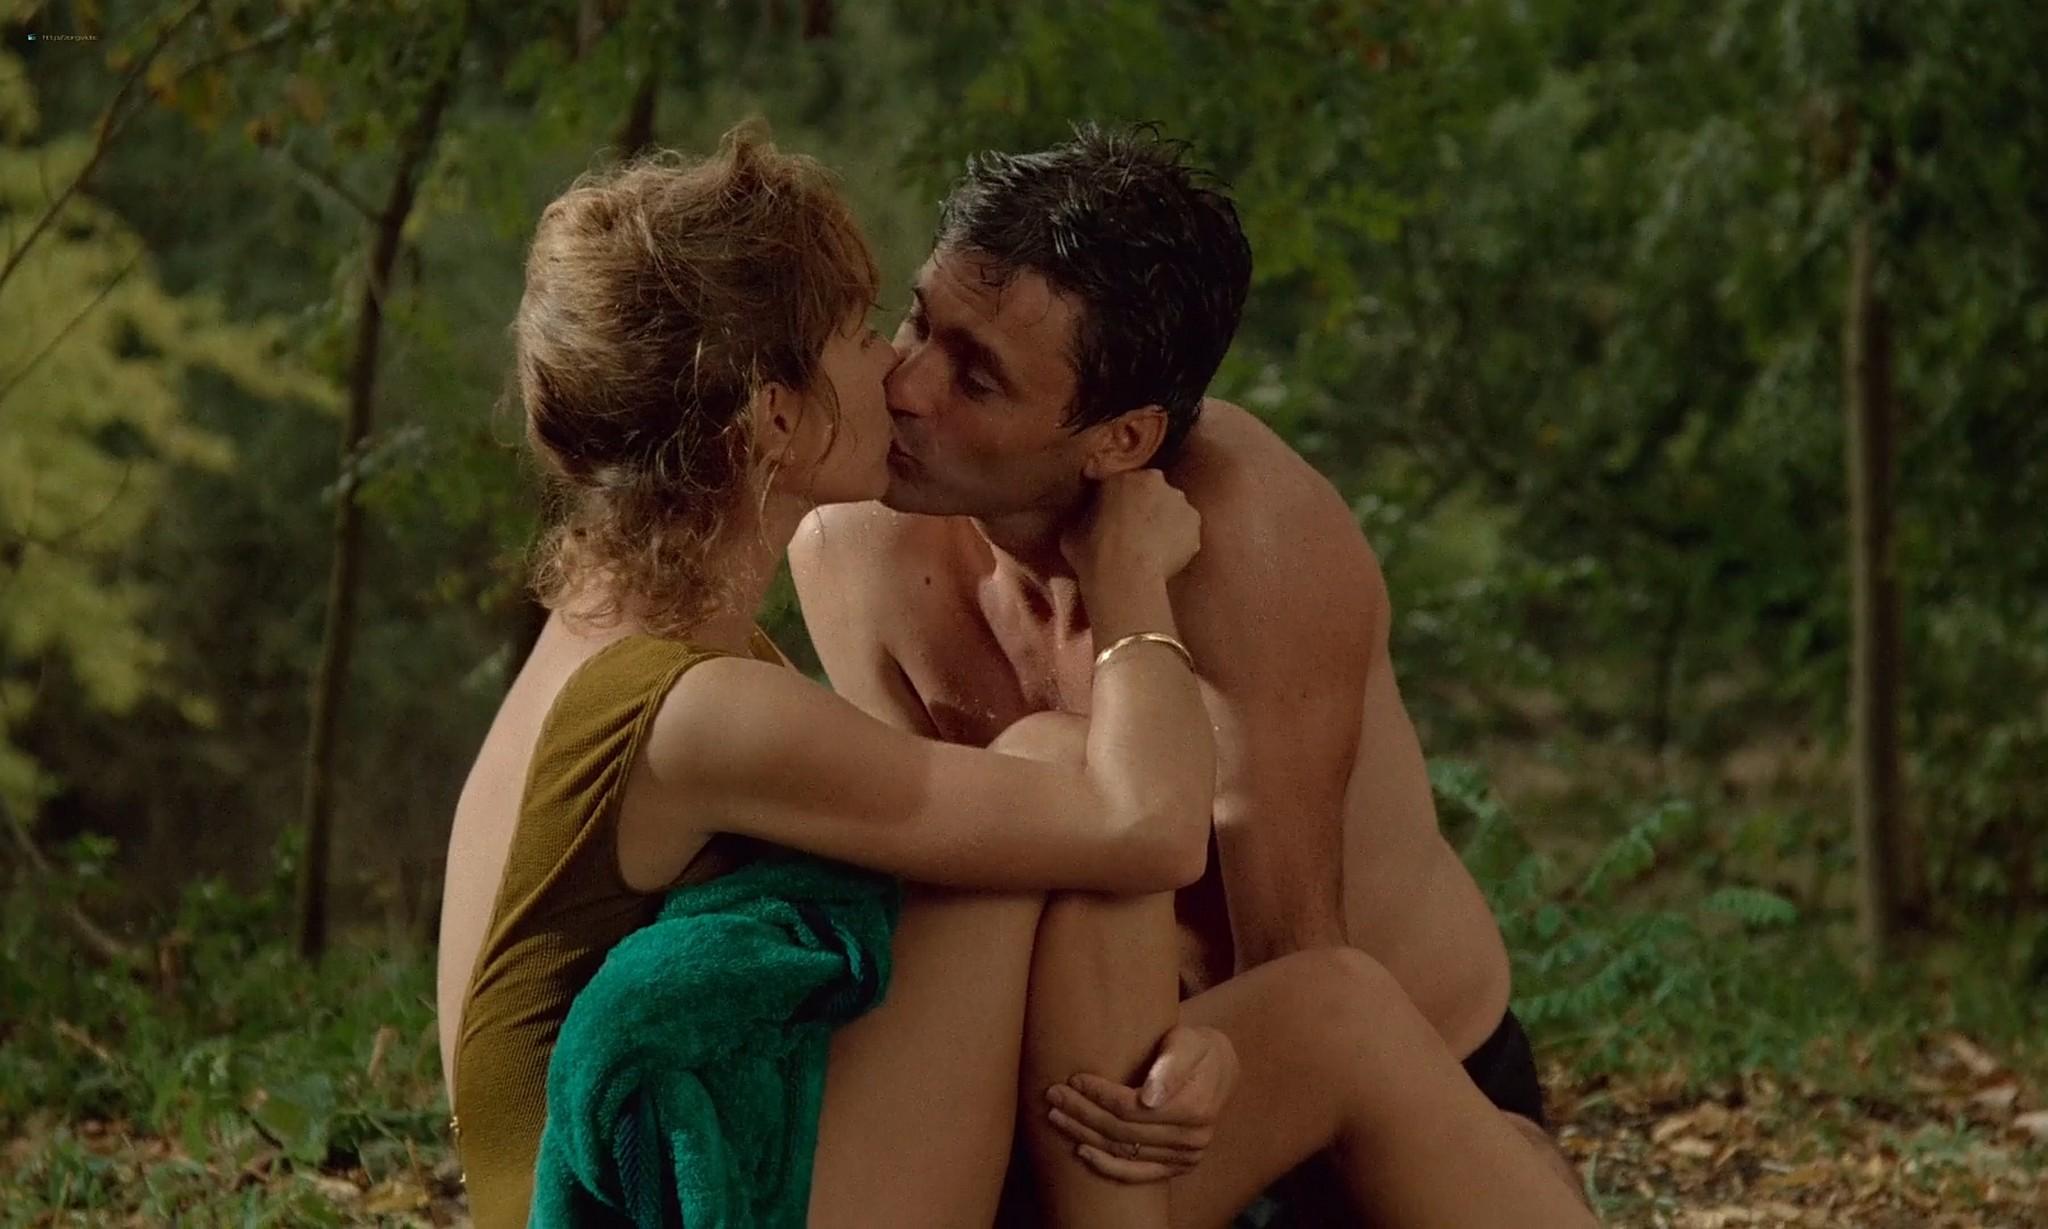 Nathalie Baye nude in the shower En toute innocence FR 1988 1080p BluRay 8